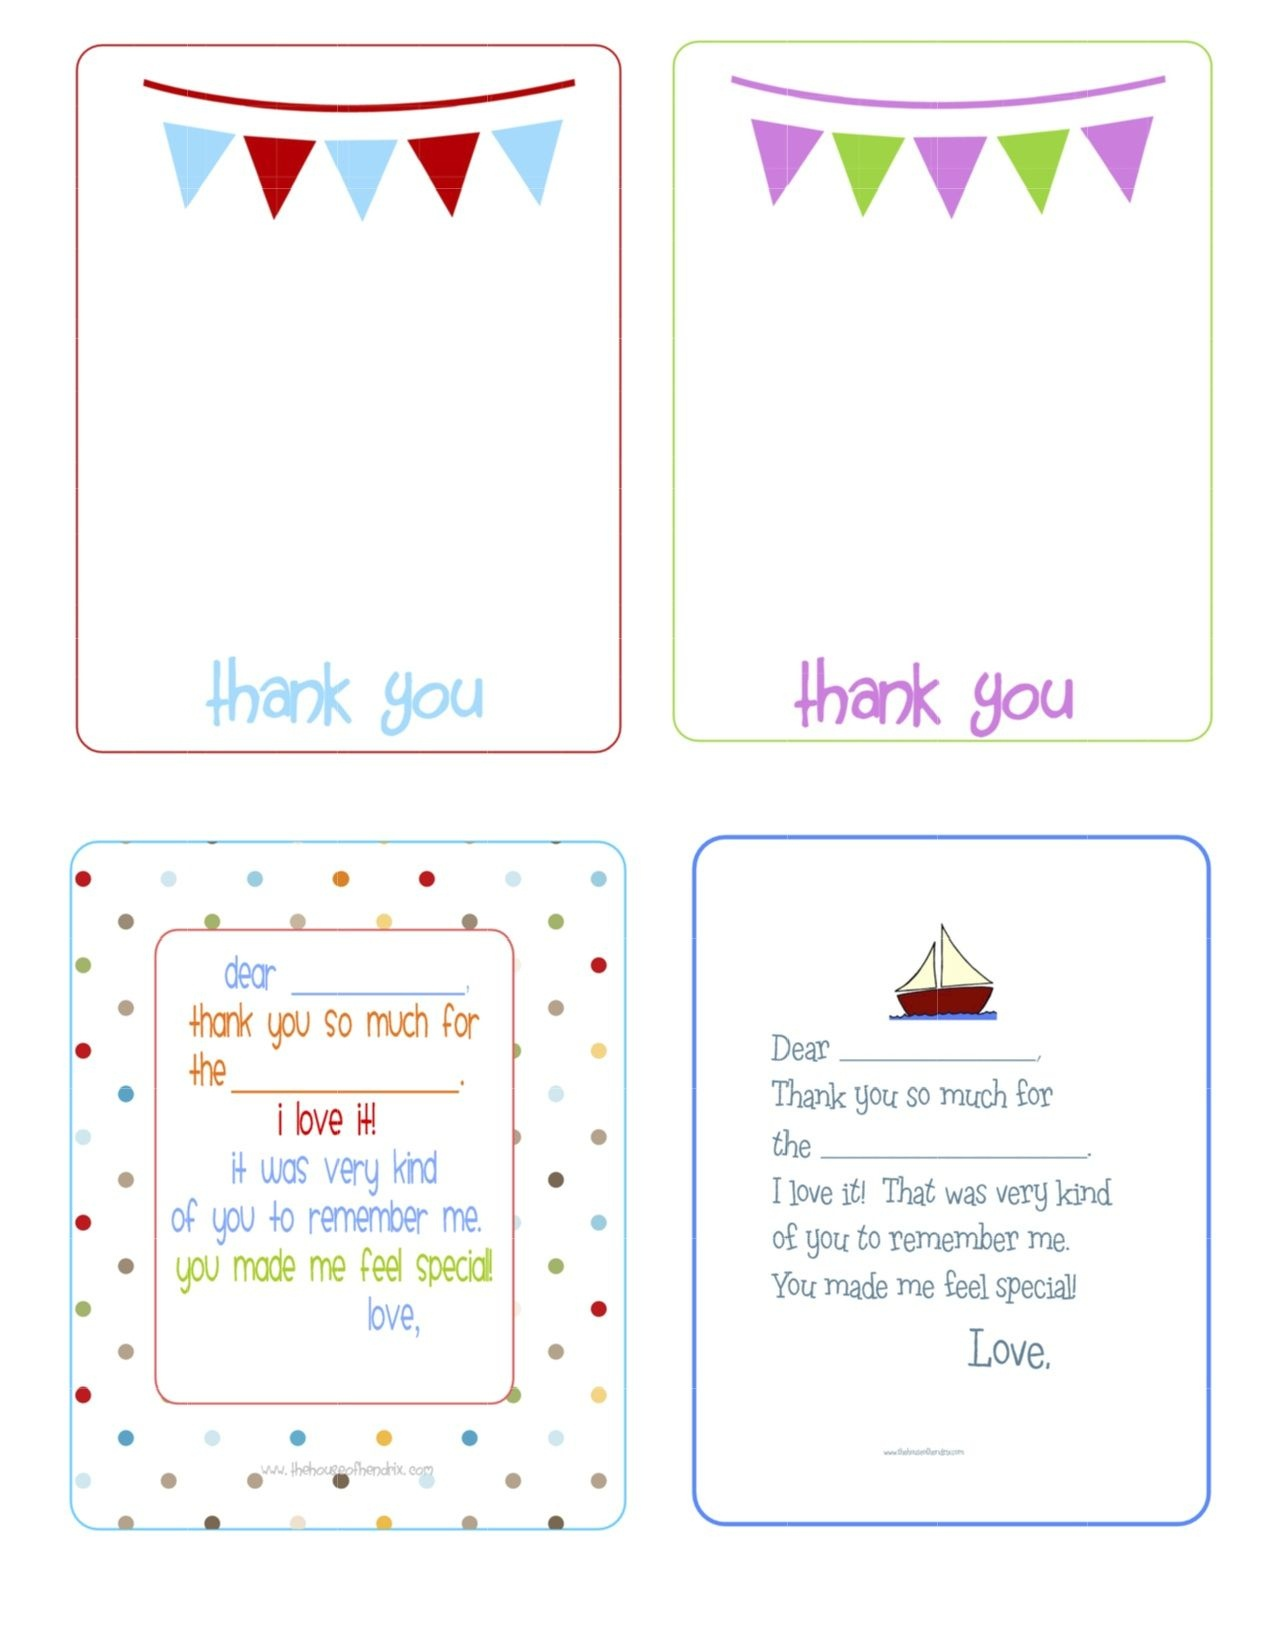 Printable Birthday Thank You Cards - | Printables & Fonts - Free Printable Thank You Cards For Soldiers